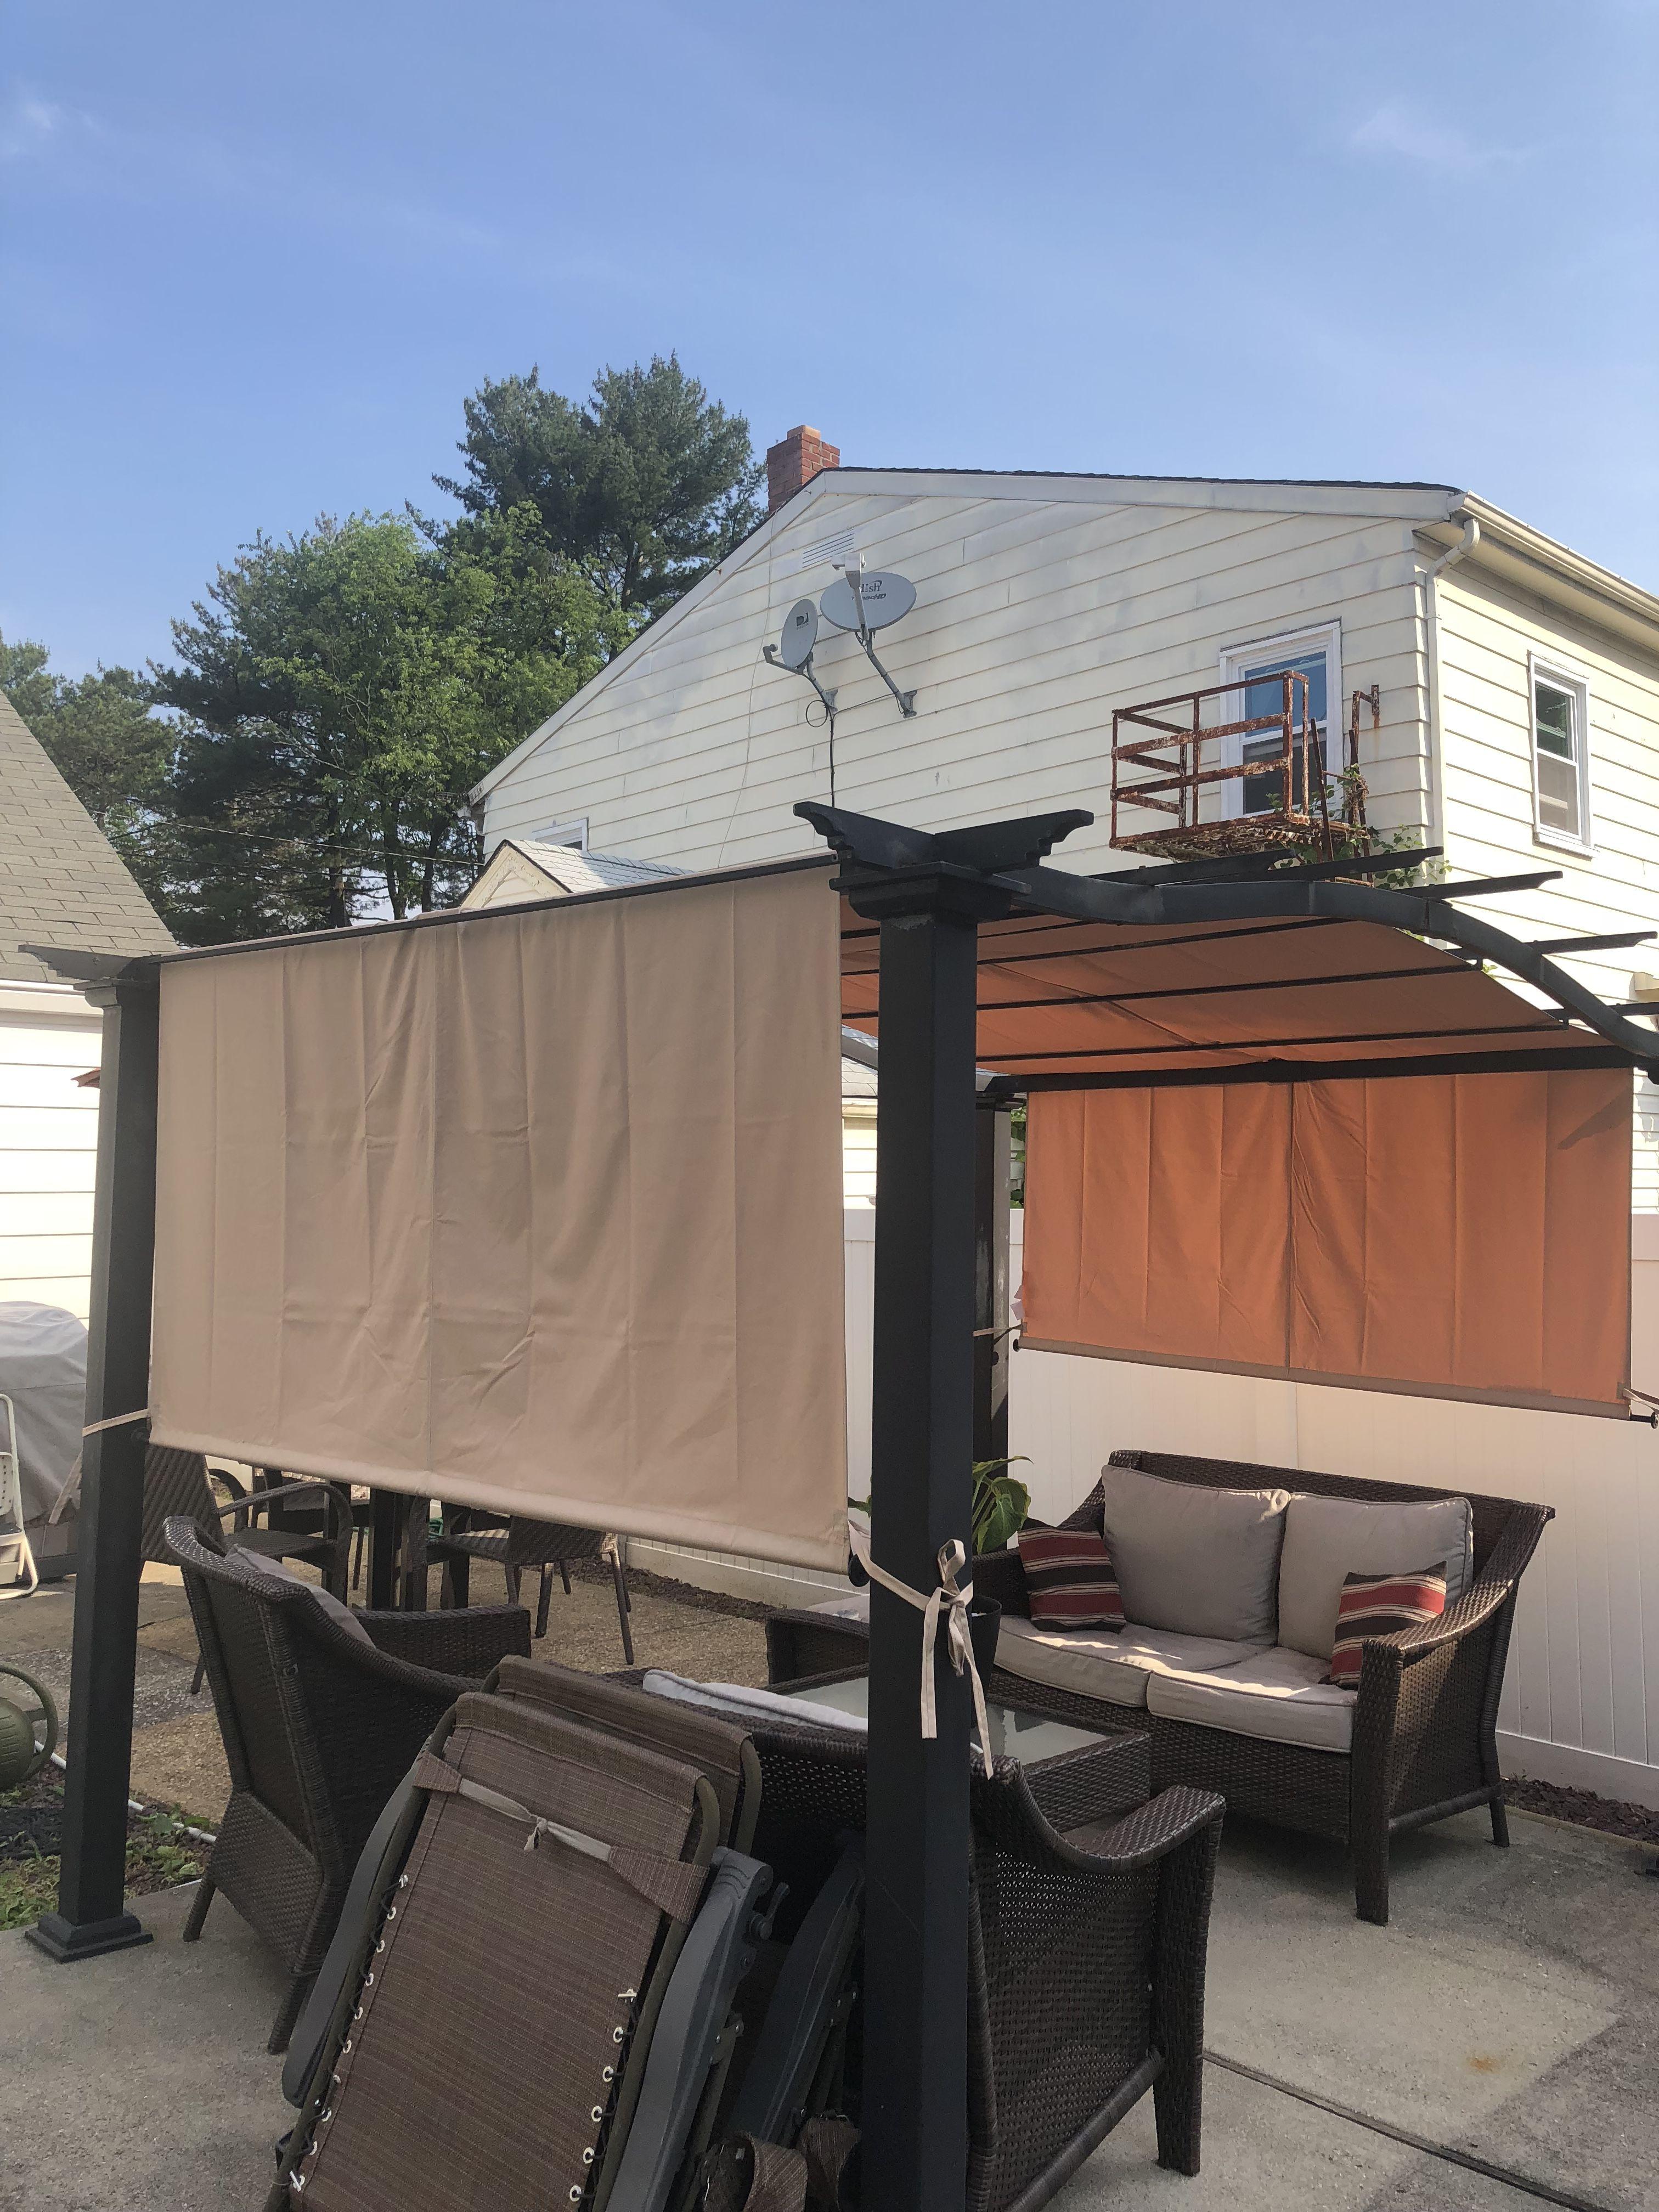 Universal Designer Replacement Pergola Shade Canopy And Cover Garden Winds Pergola Shade Shade Canopy Building A Pergola